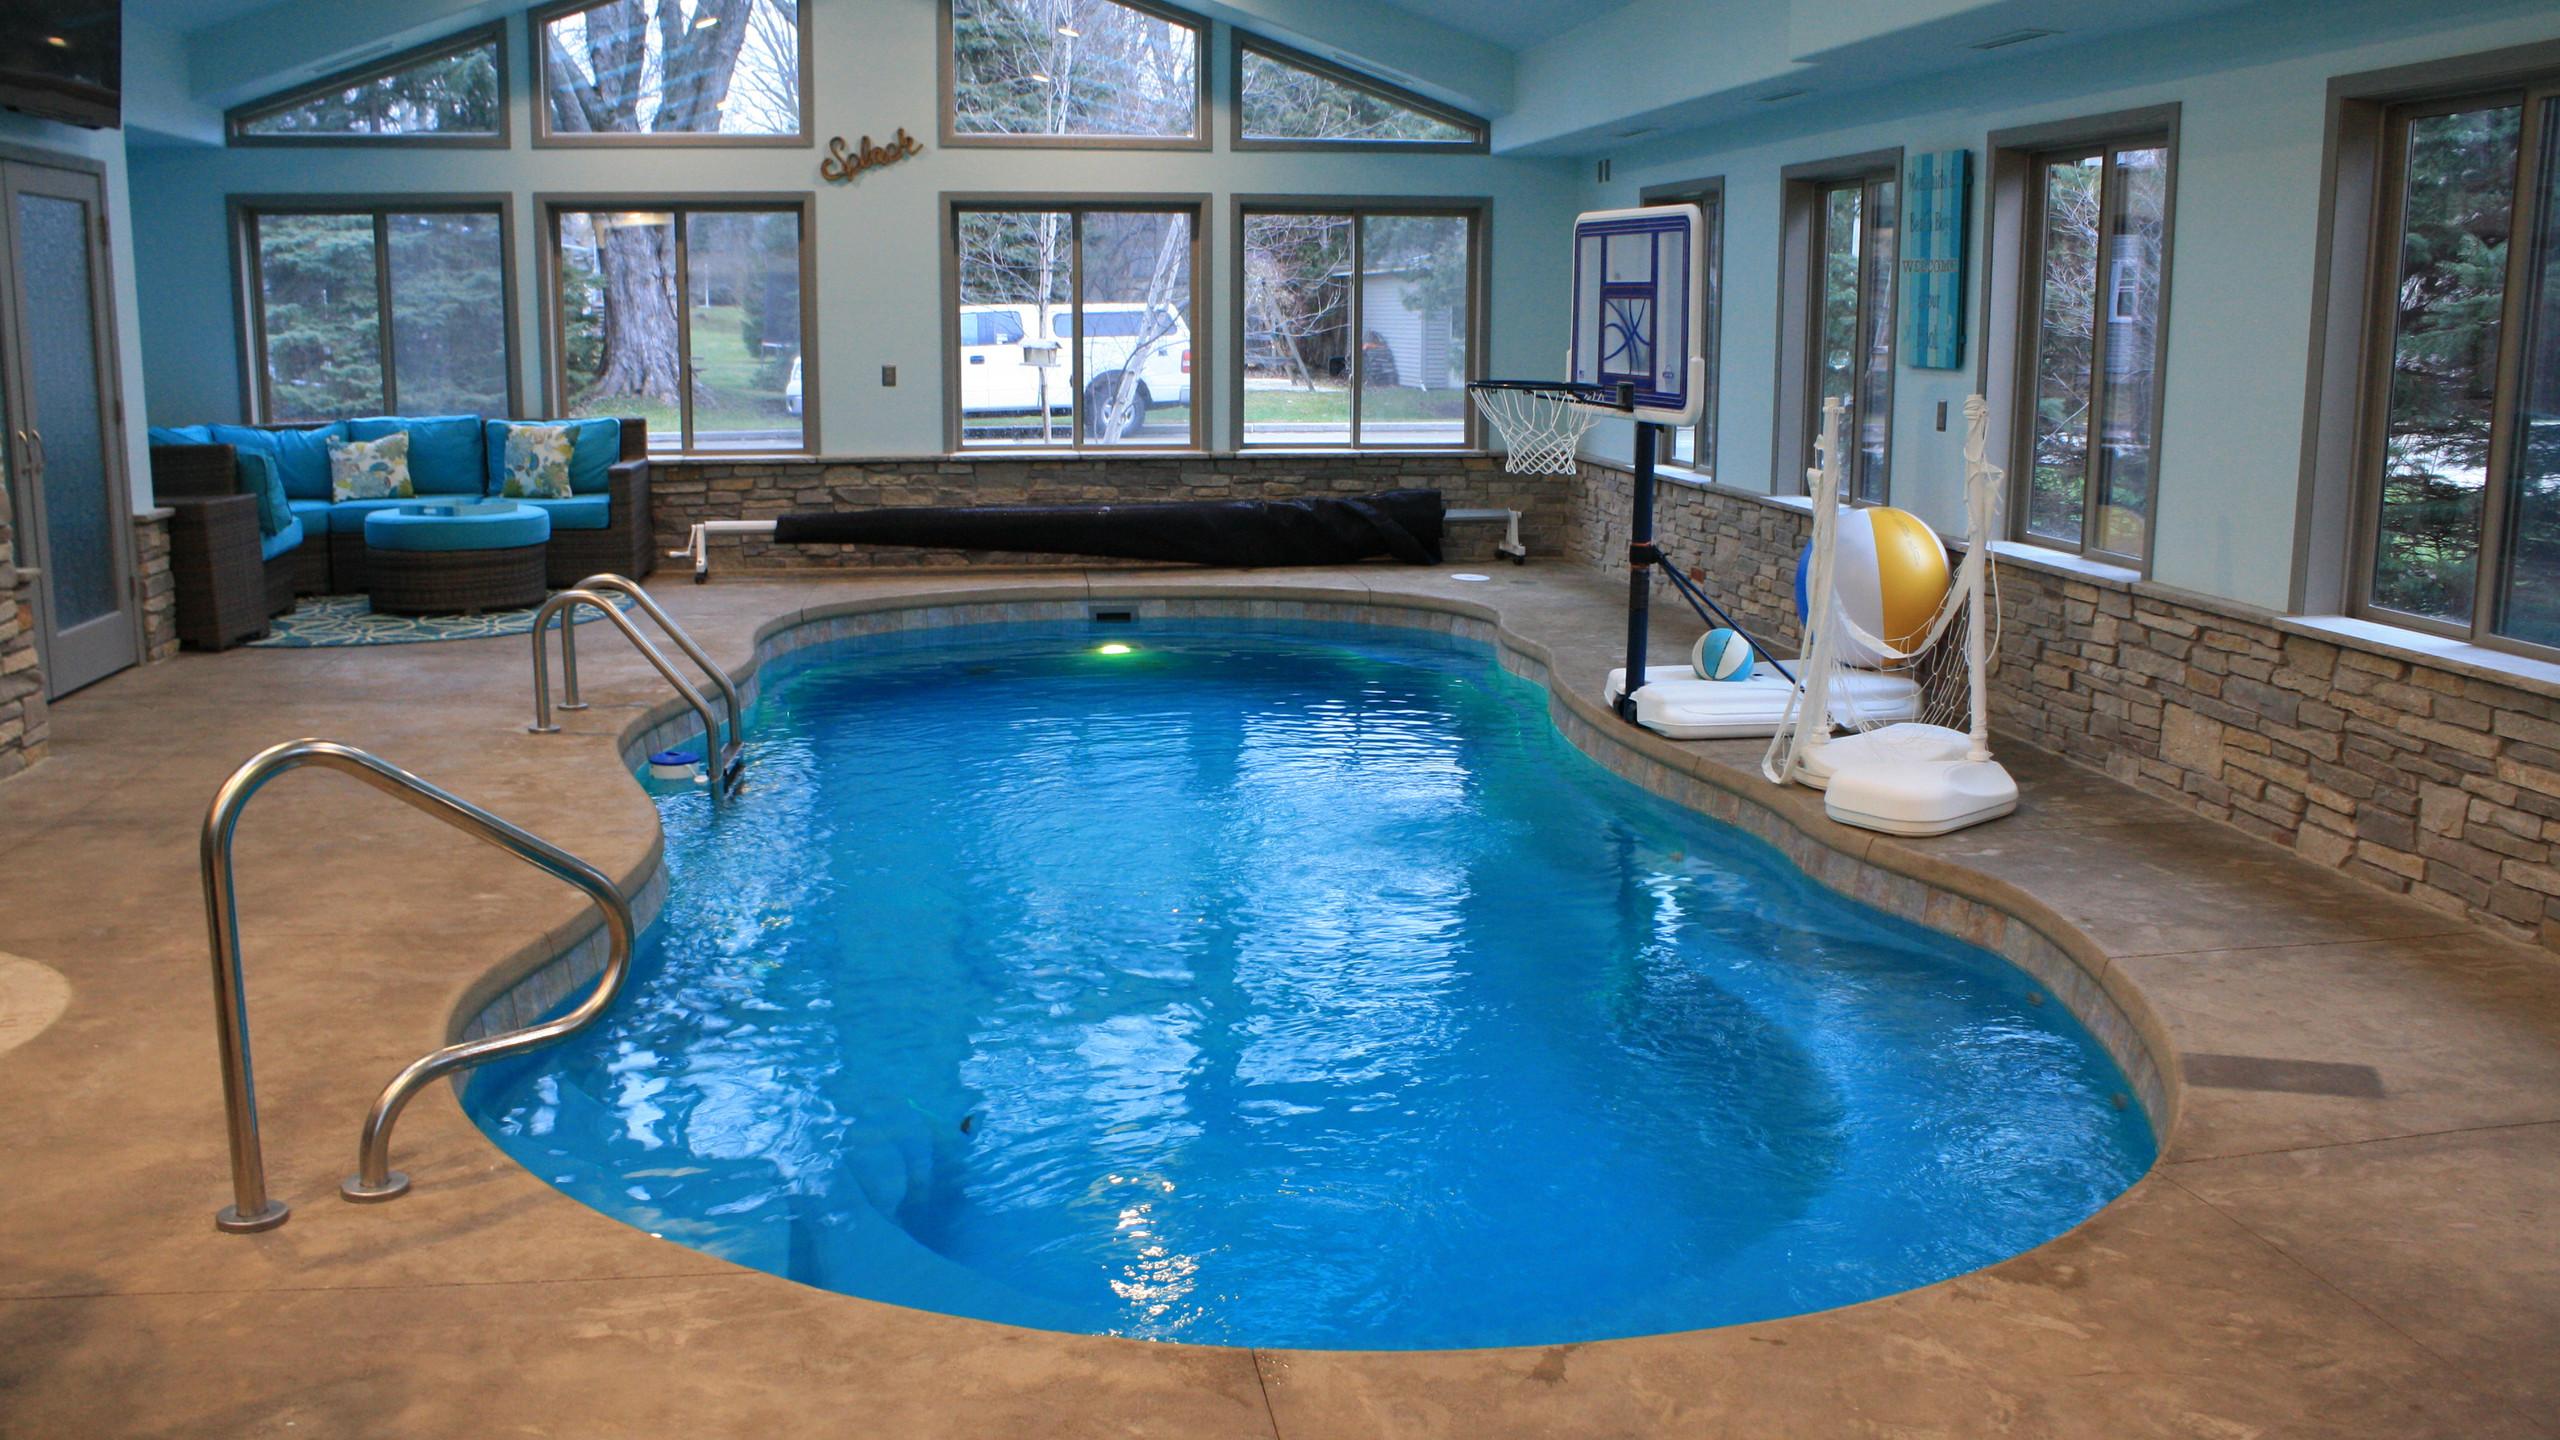 APSP Gold Award for Residential Interior Pool in Green Lake, WI